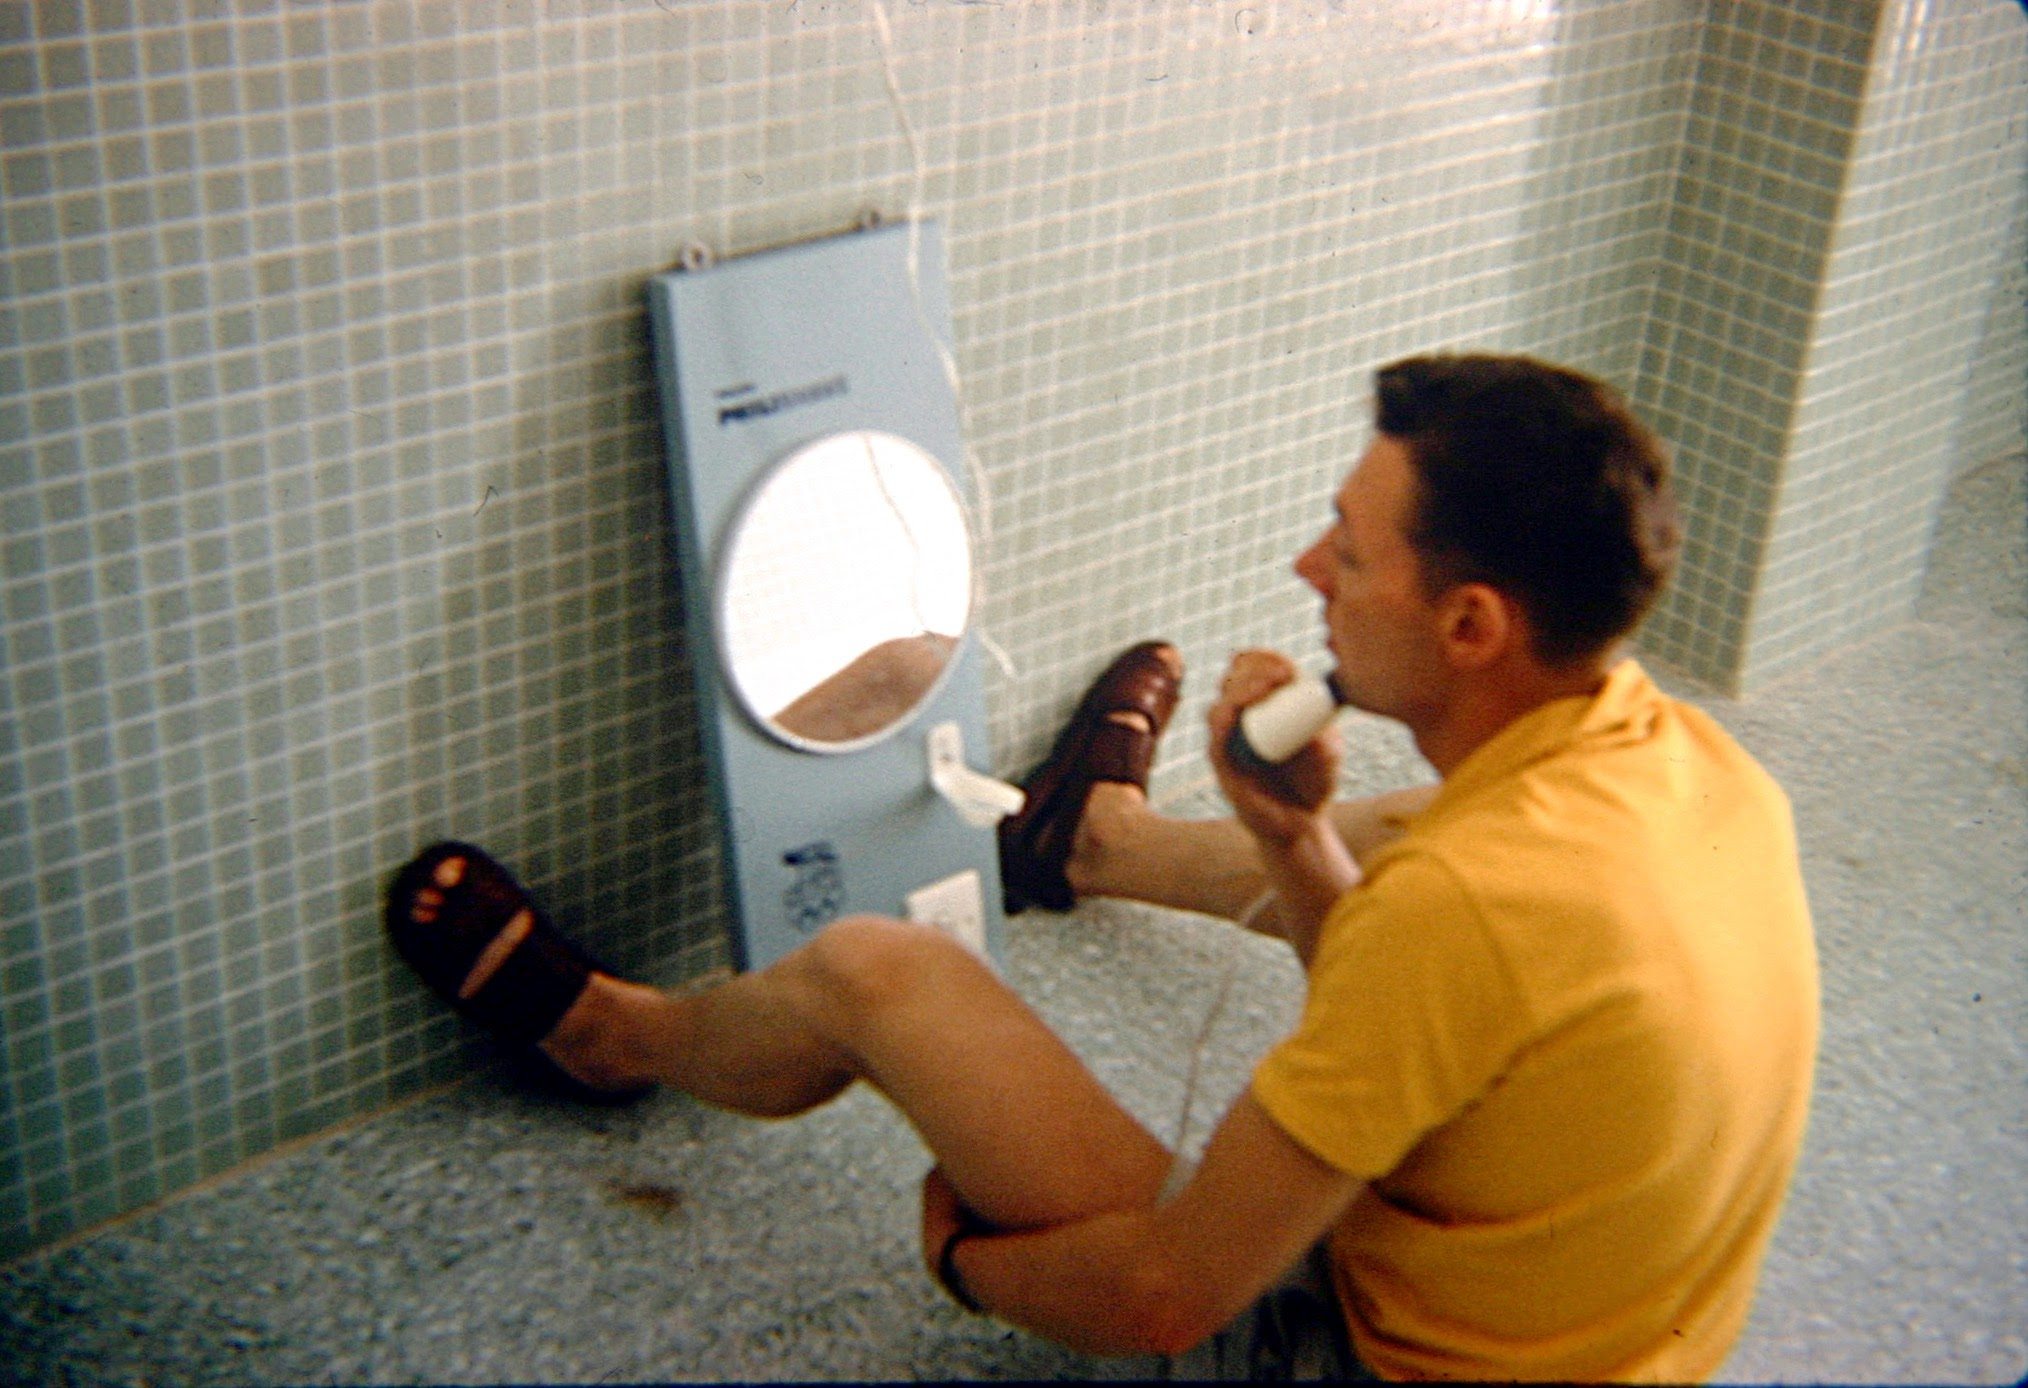 Seamus Herron making use of the basic facilities in the Olympic Village. (Photo: © Sean B. Fox)